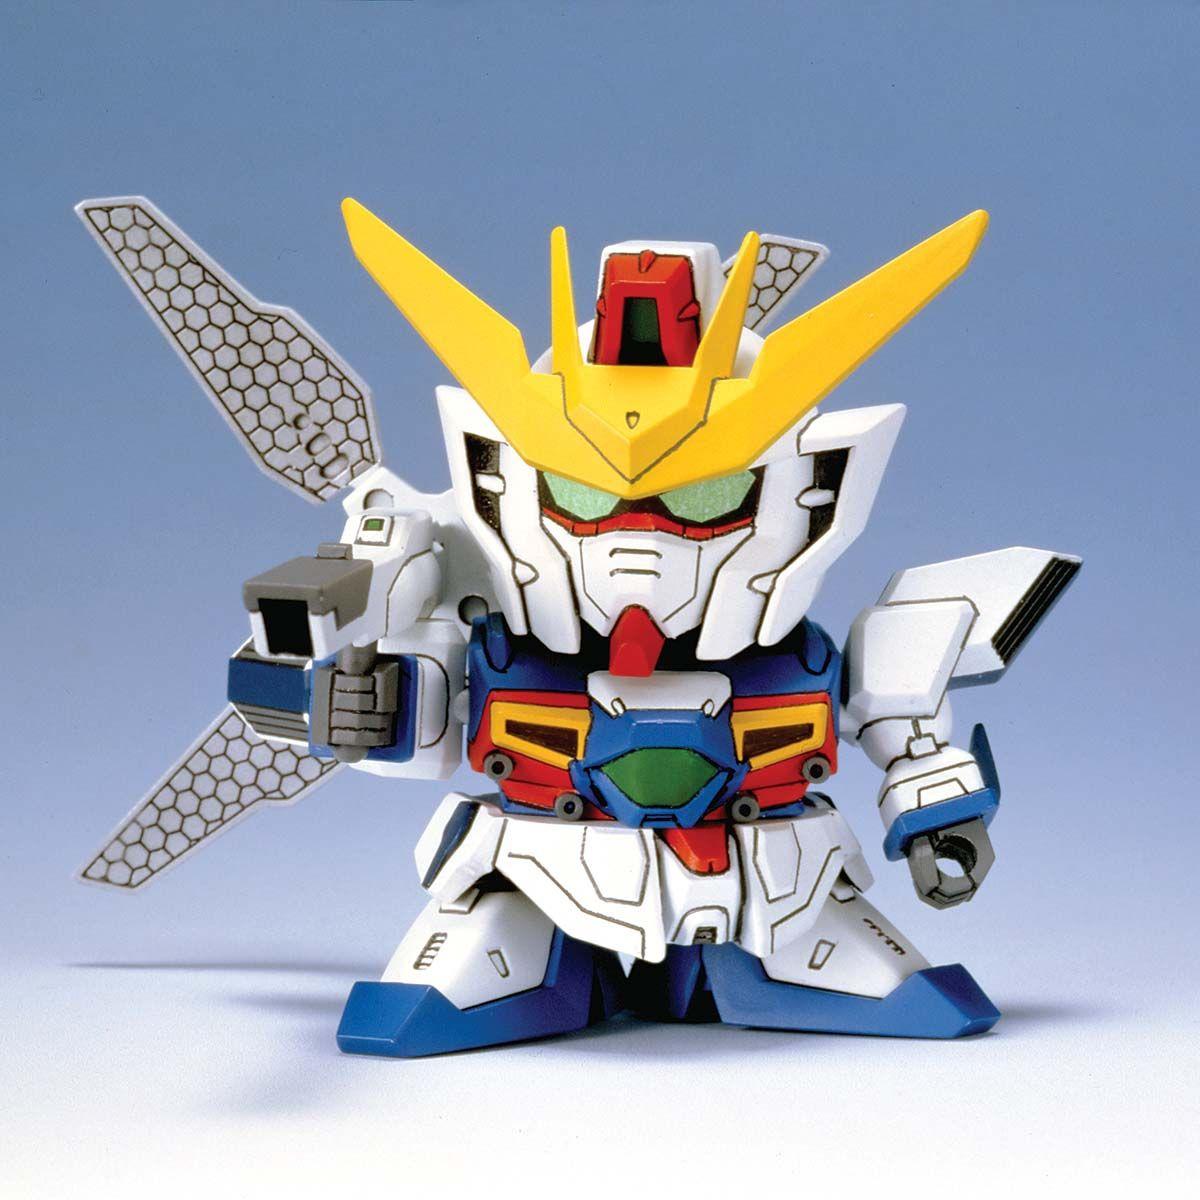 96587SDガンダム GジェネレーションZERO(GGENERATION-0) 029 GX-9900 ガンダムエックス [Gundam X] 0075670 5060794 4573102607942 4902425756707